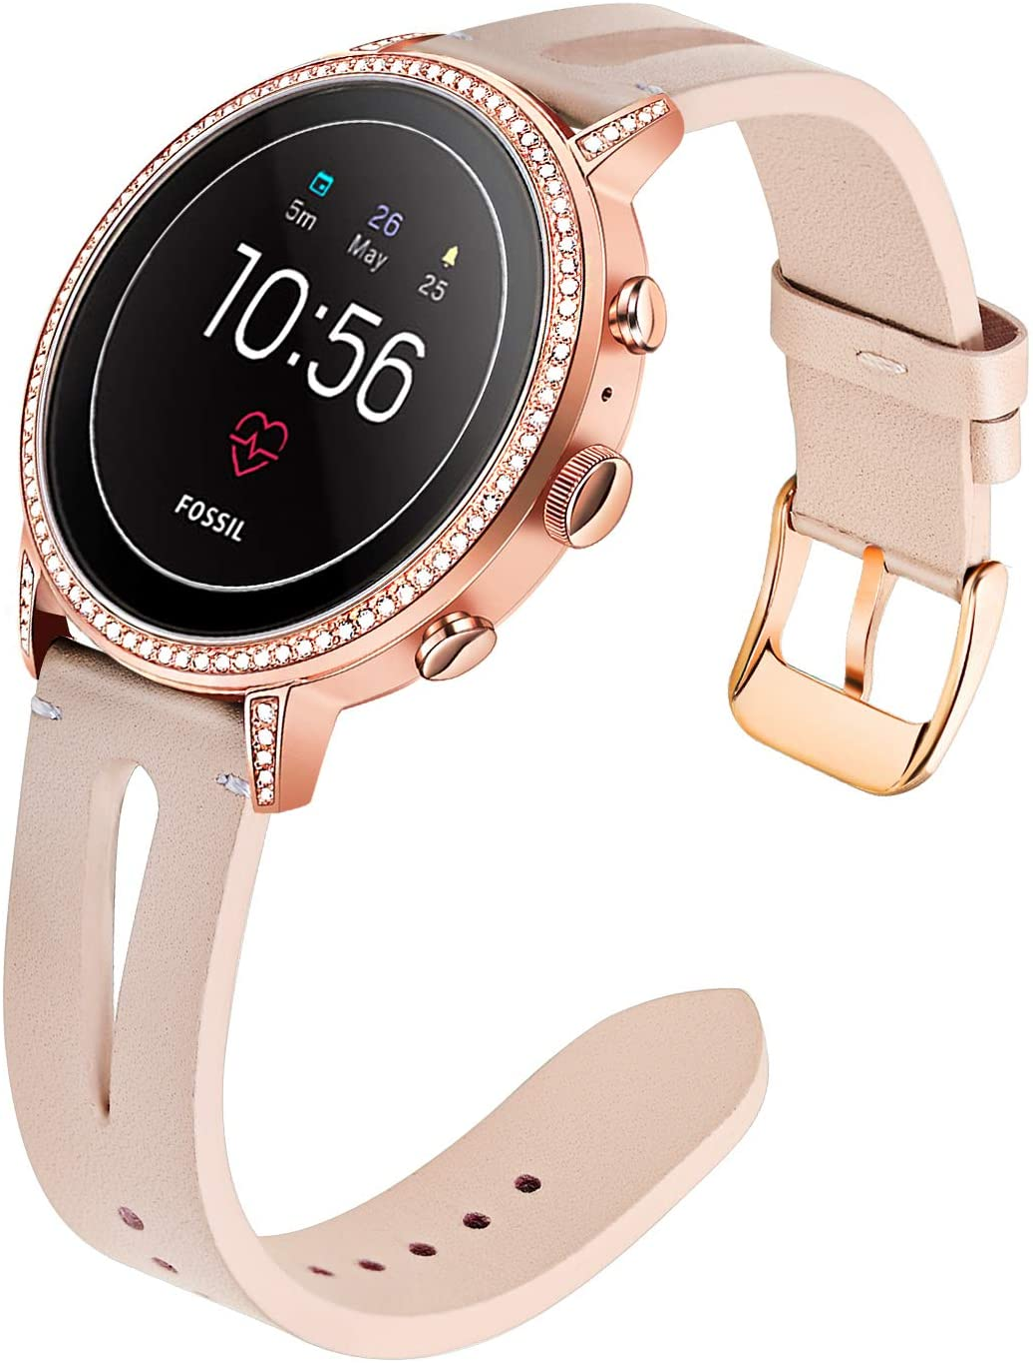 TRUMiRR Watch Band for Fossil Women's Max 44% OFF 4 Gen Credence 18mm Venture HR